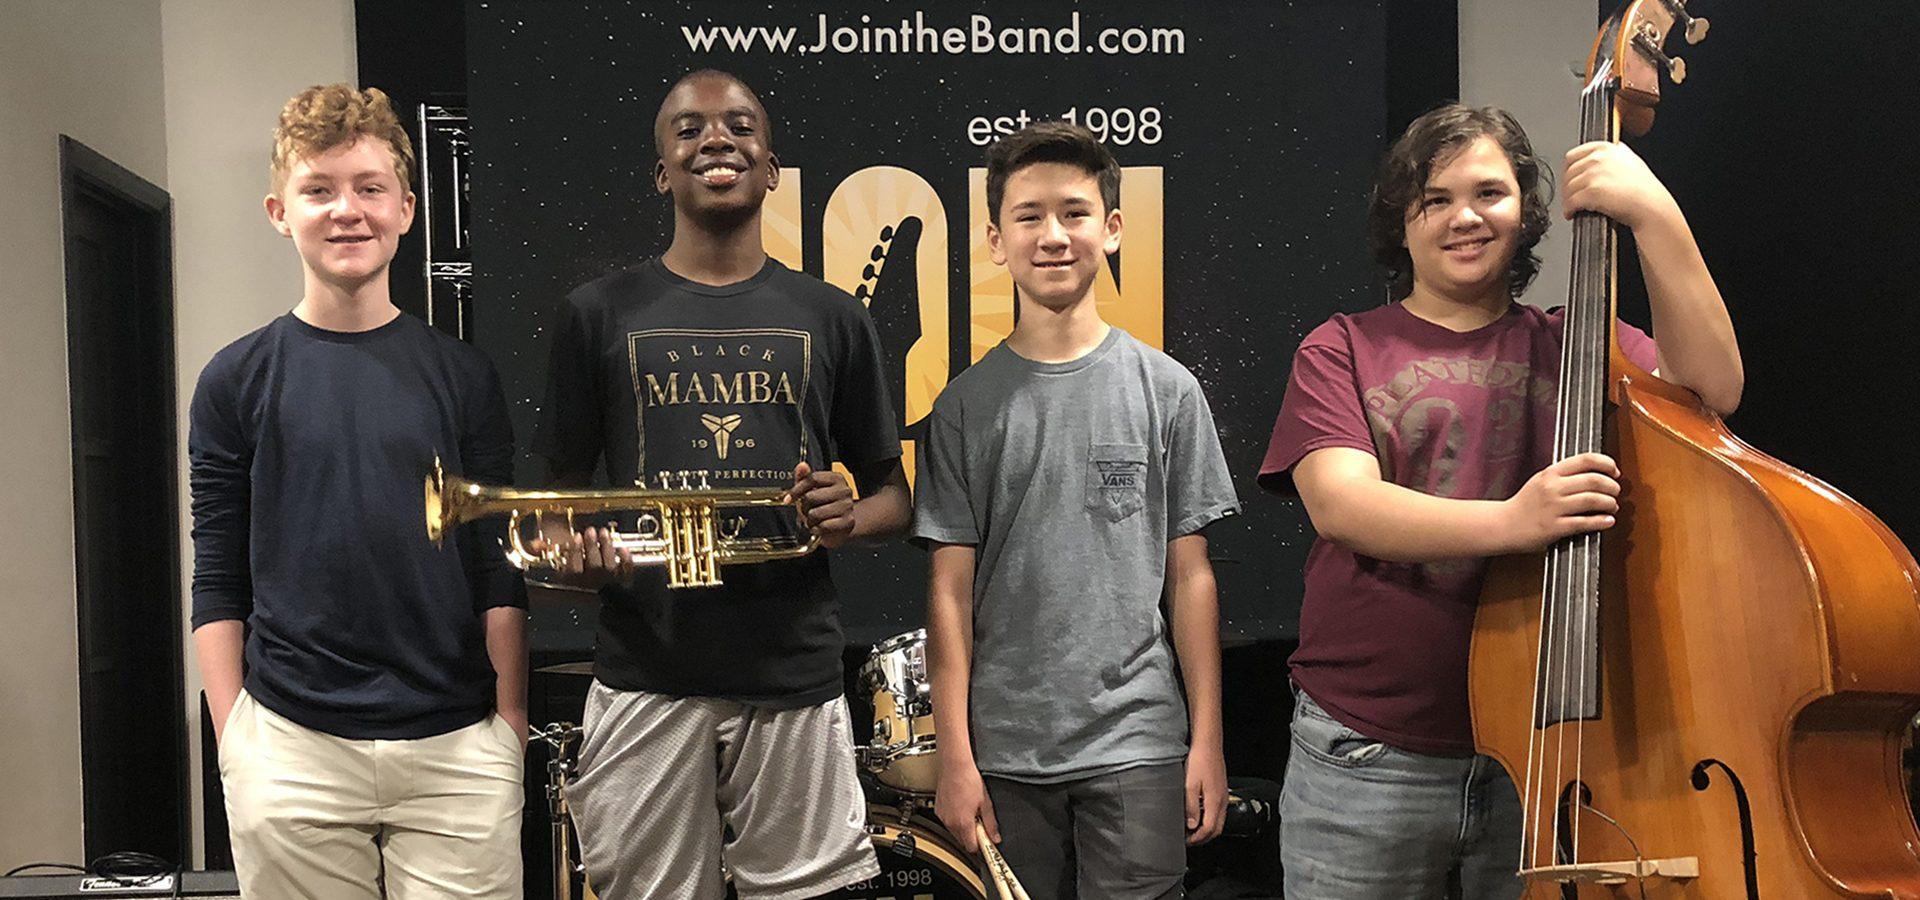 Jazz & Blues Music Camp - Quartet - Sherman Oaks, Los Angeles - Join The Band